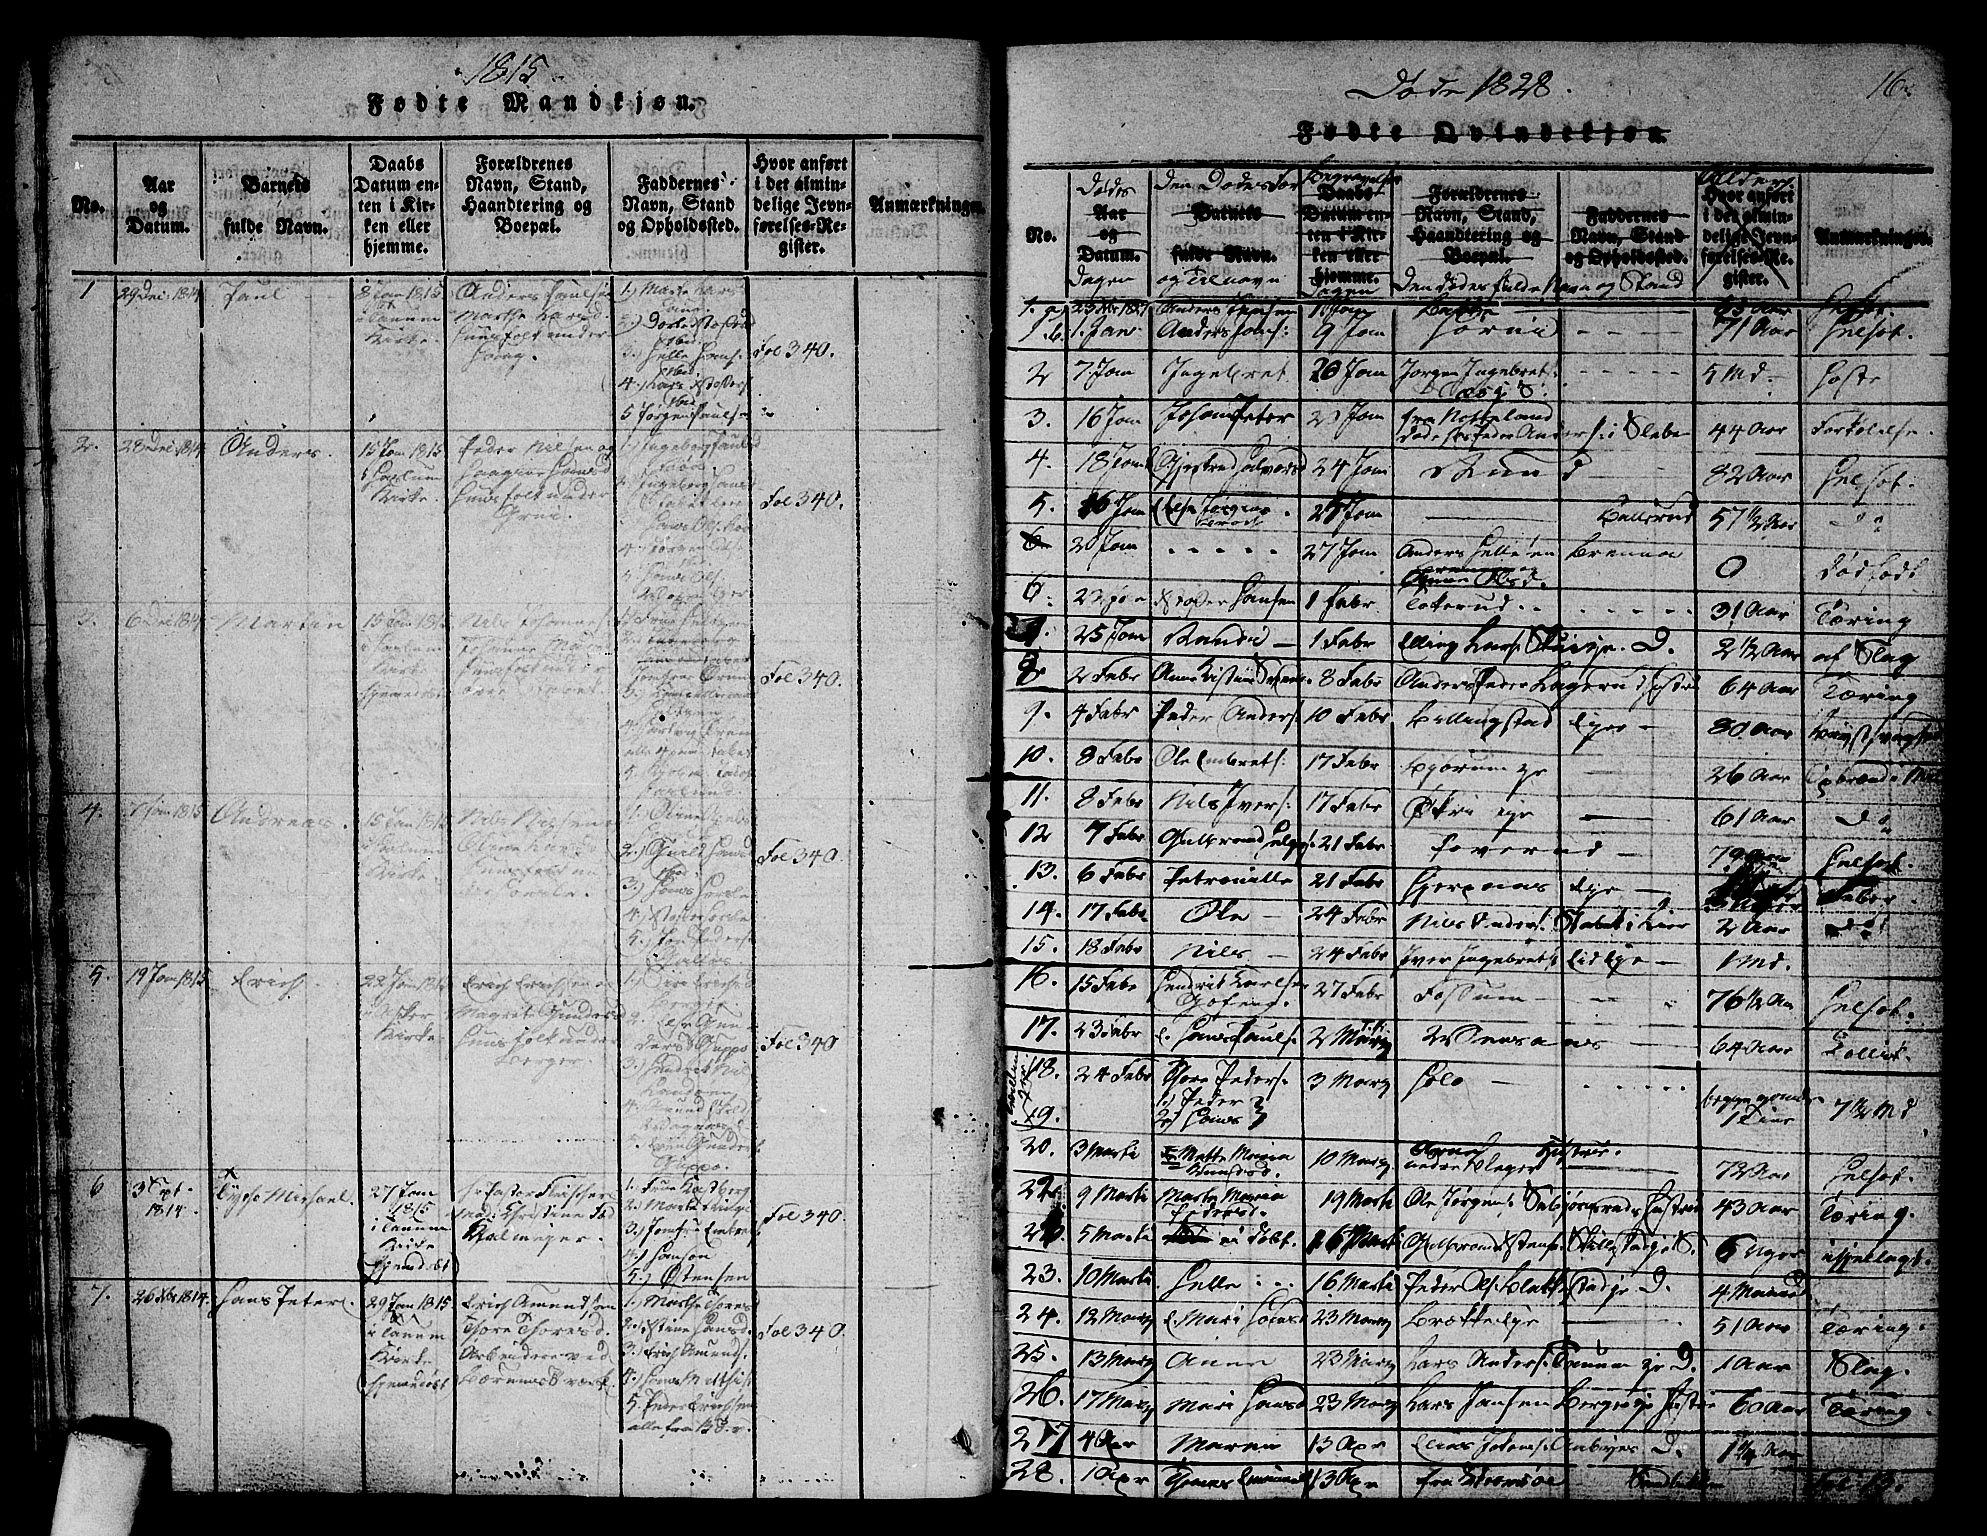 SAO, Asker prestekontor Kirkebøker, G/Ga/L0001: Klokkerbok nr. I 1, 1814-1830, s. 16